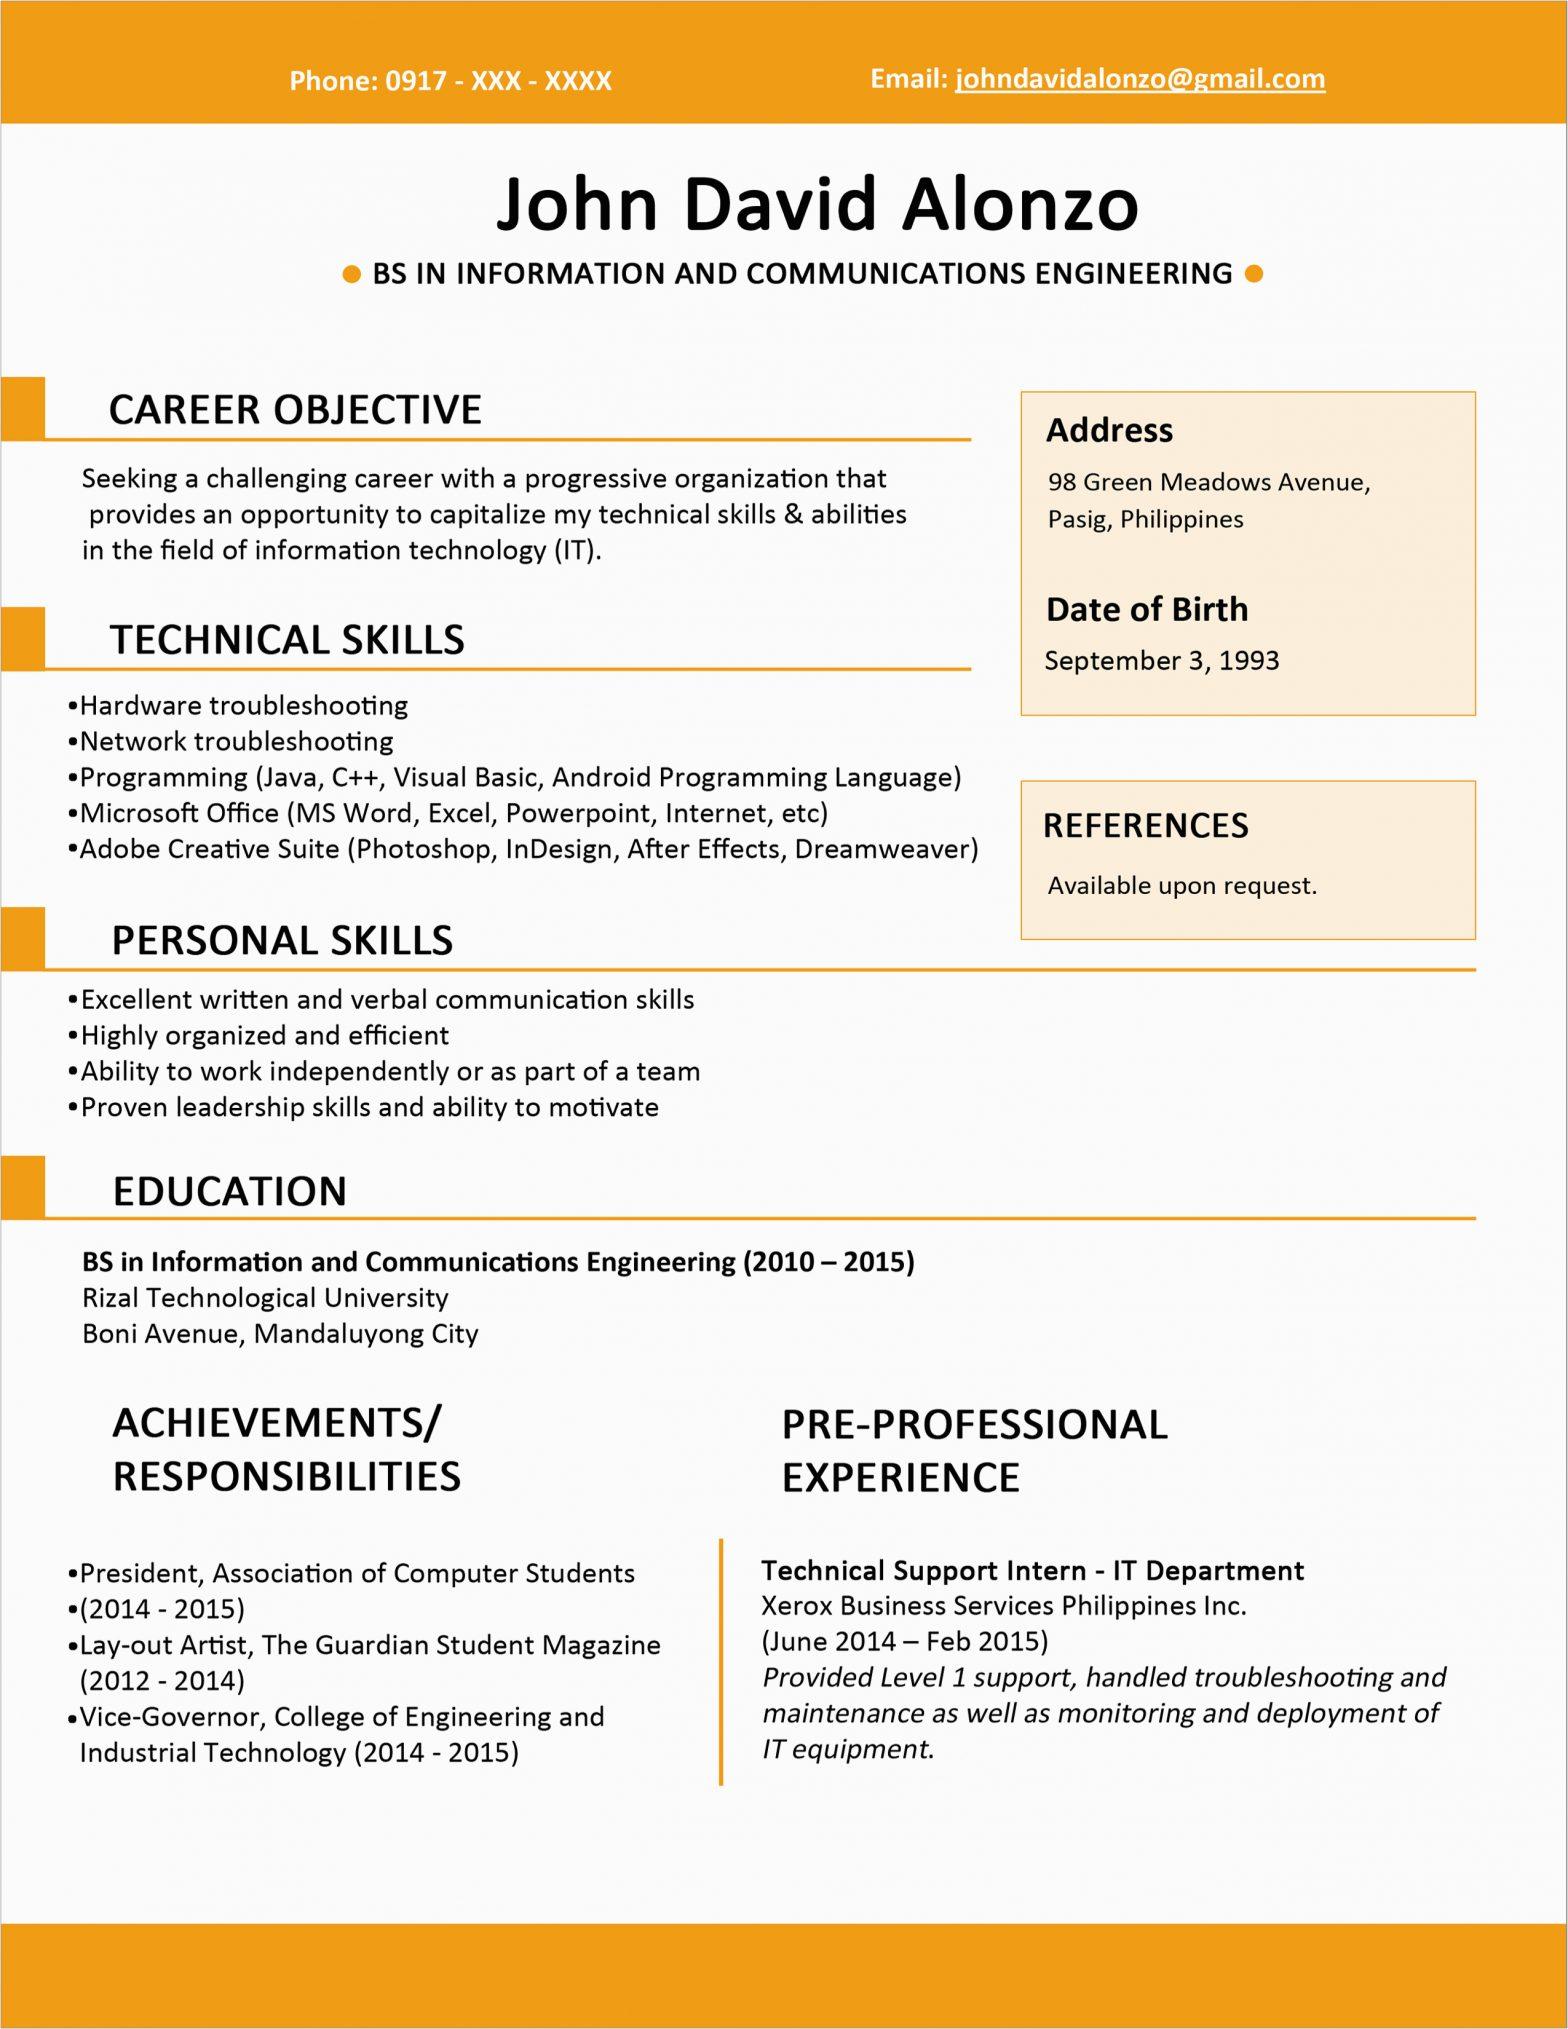 Resume Skills Sample for Fresh Graduate Sample Resume format for Fresh Graduates E Page format